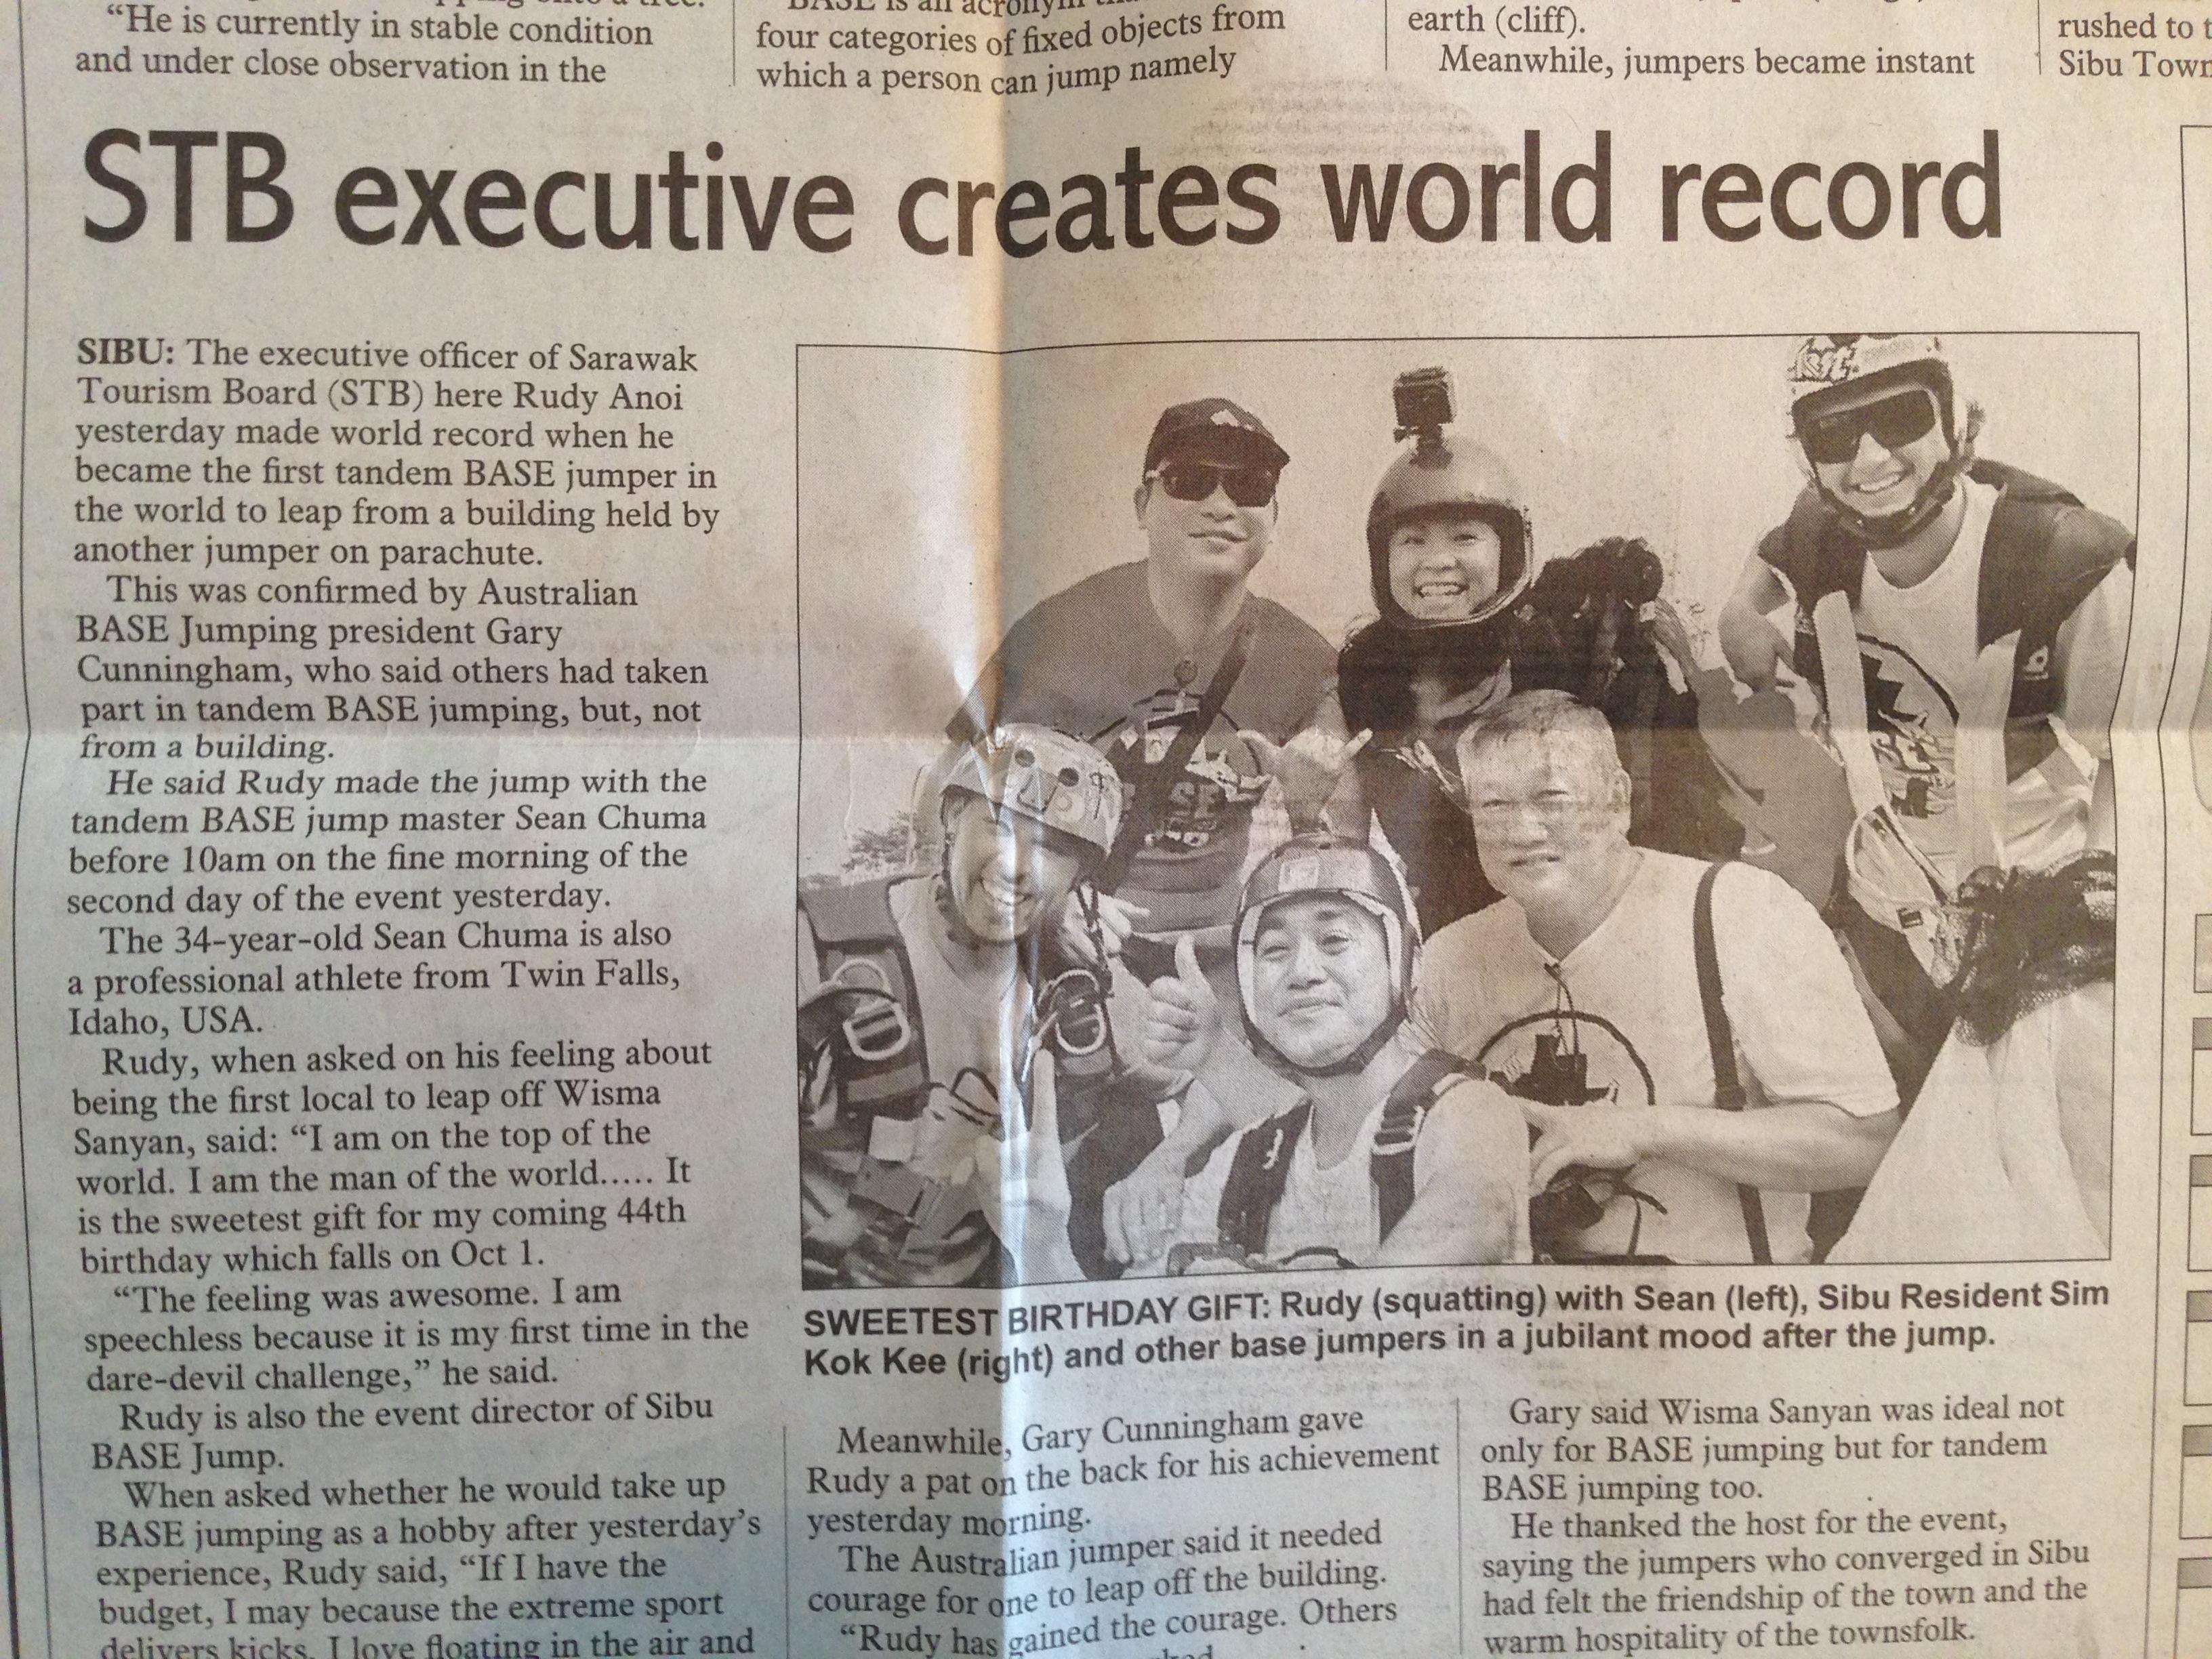 The Sunday Times (Malásia)